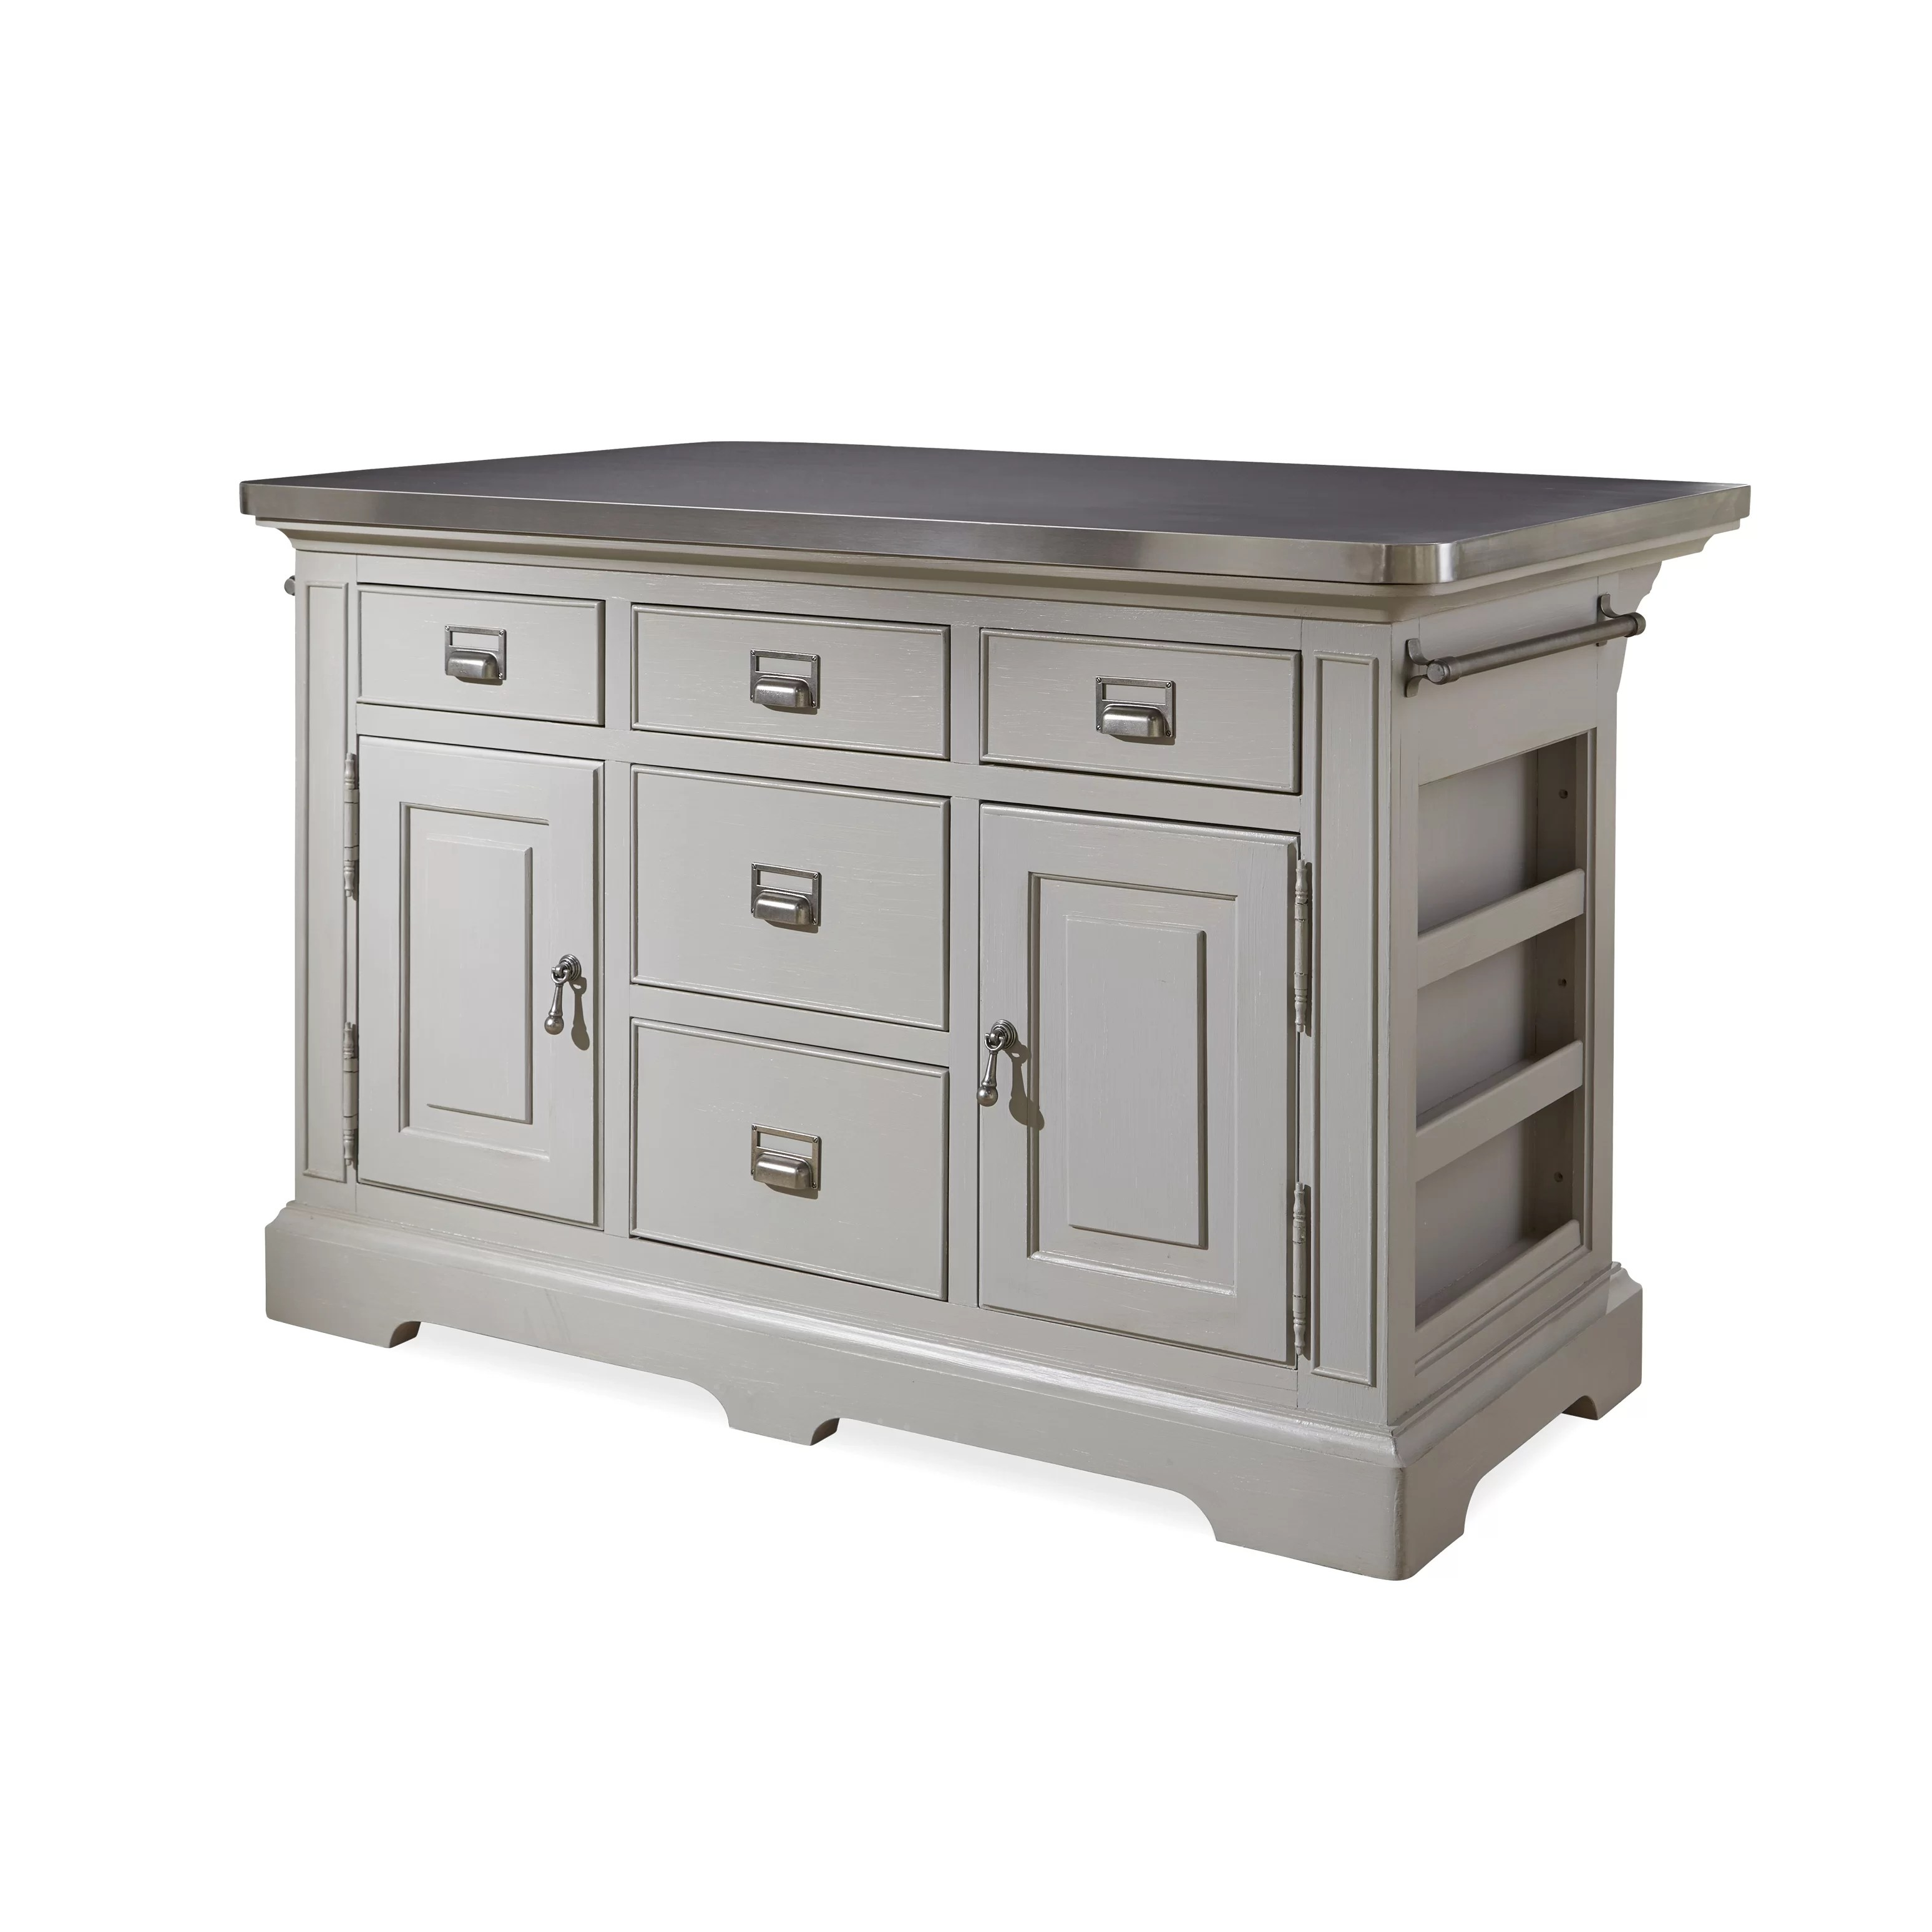 stainless steel kitchen cart with drawers pot racks paula deen home dogwood island